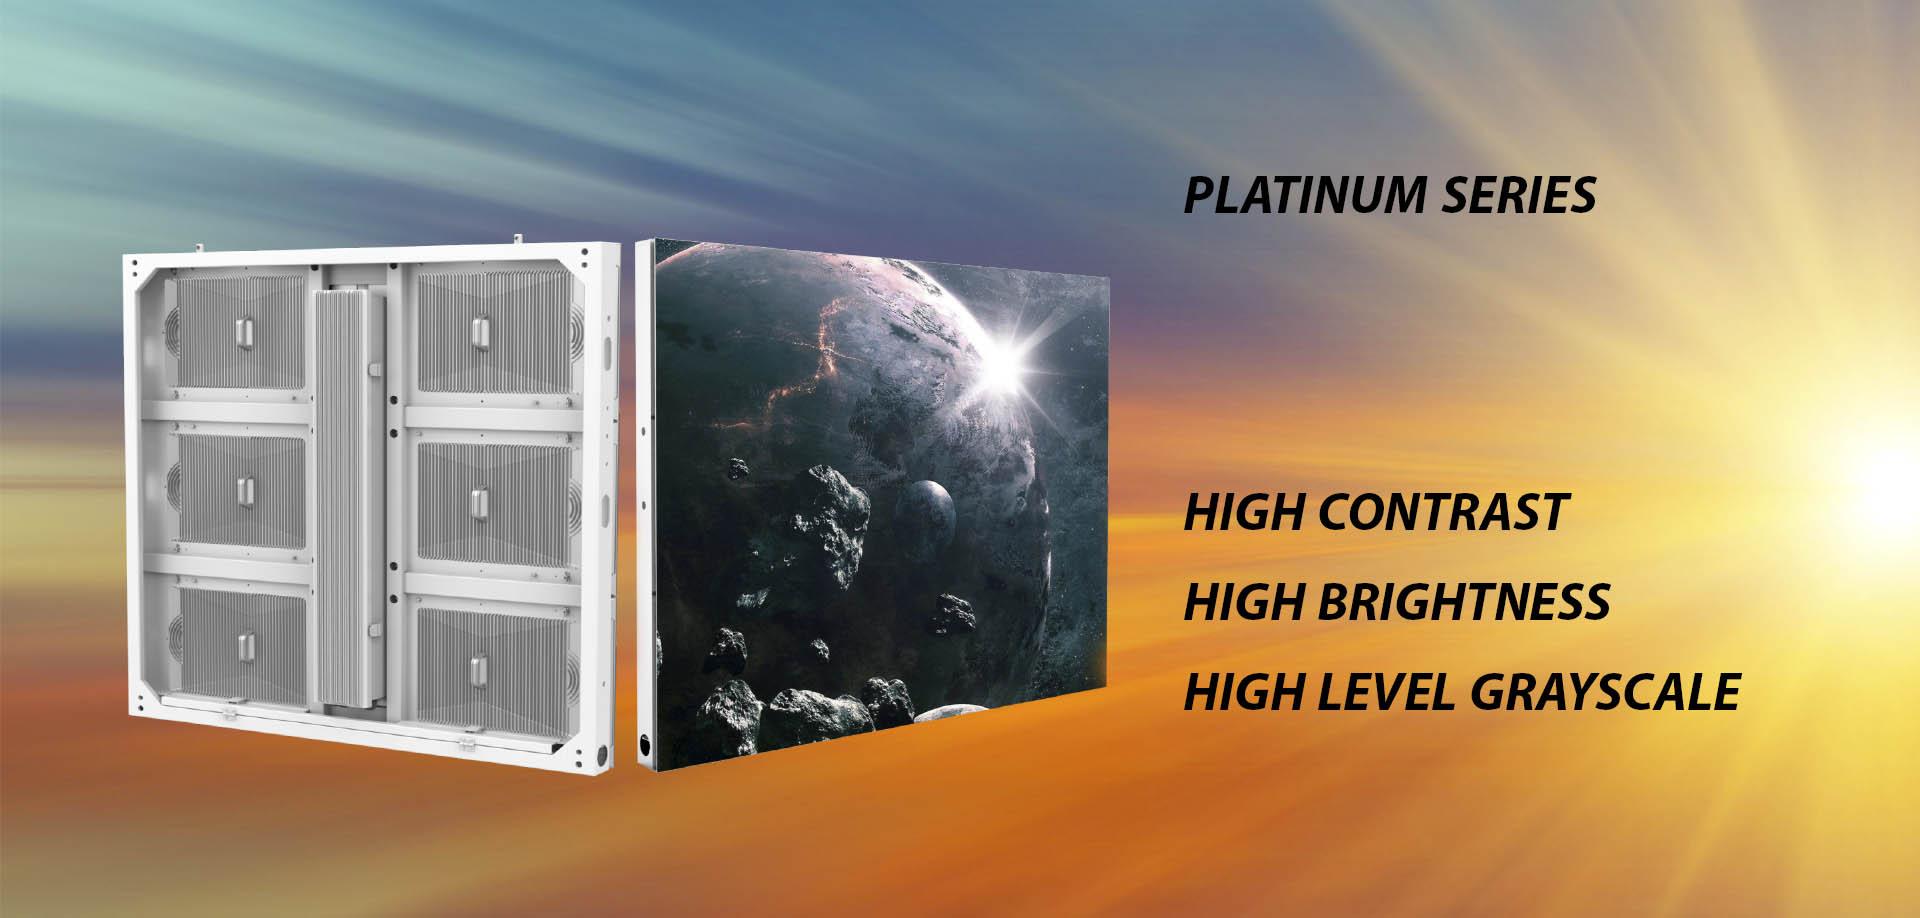 led display platinum series